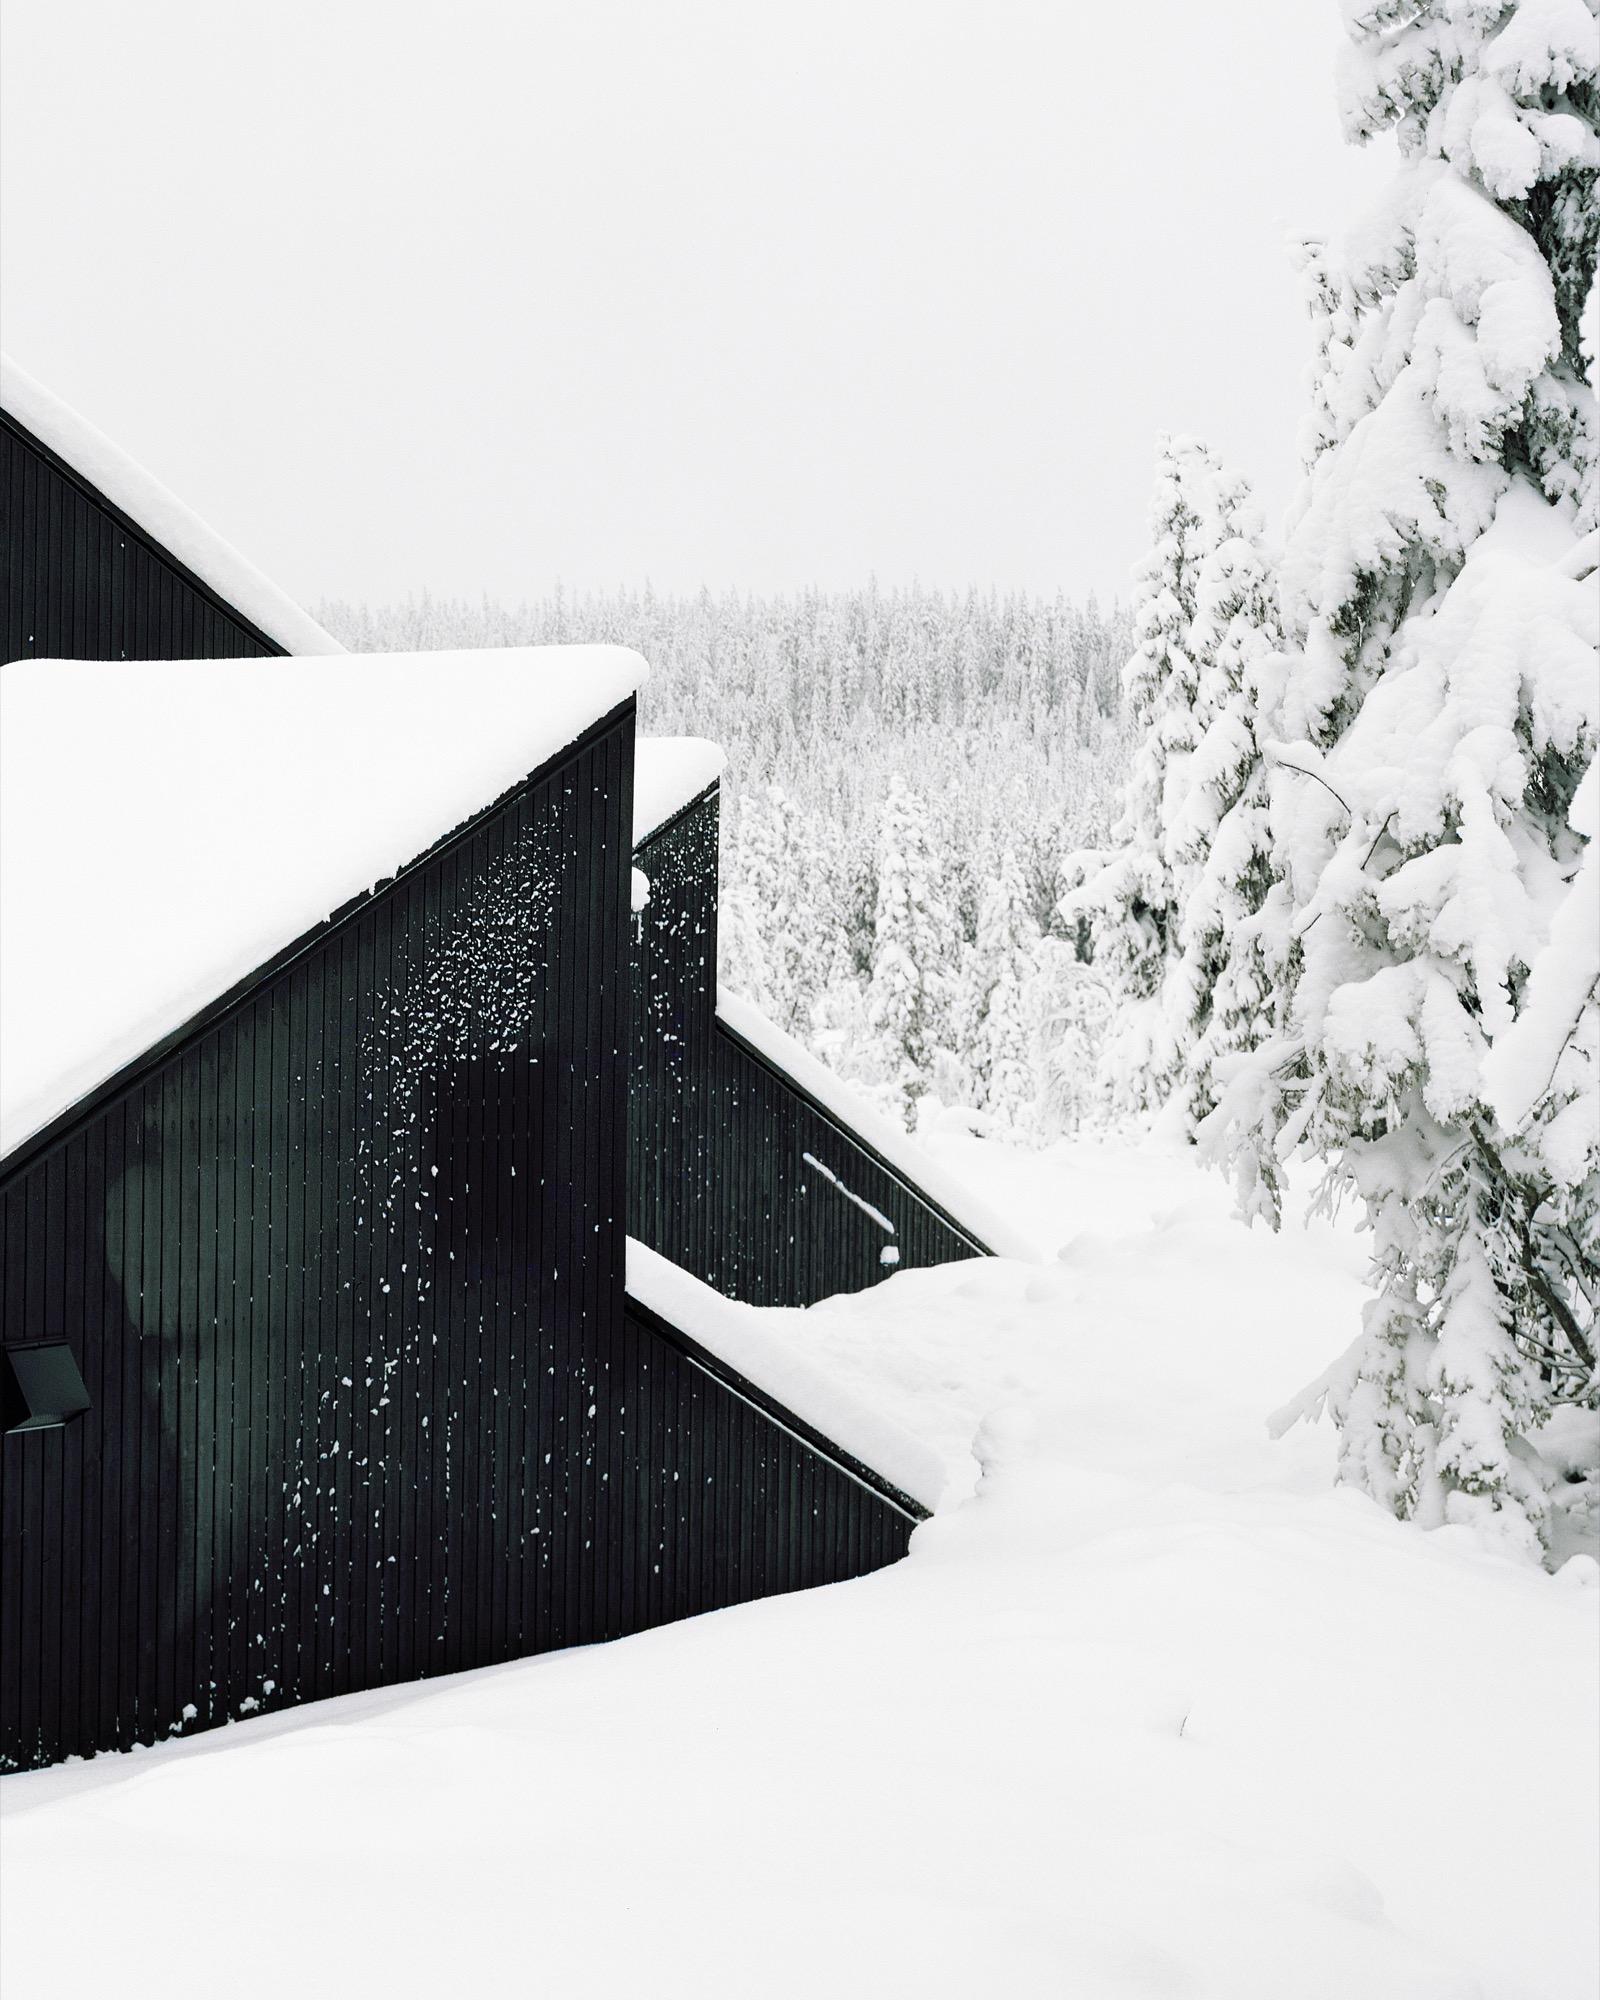 Photo by Rasmus Norlander